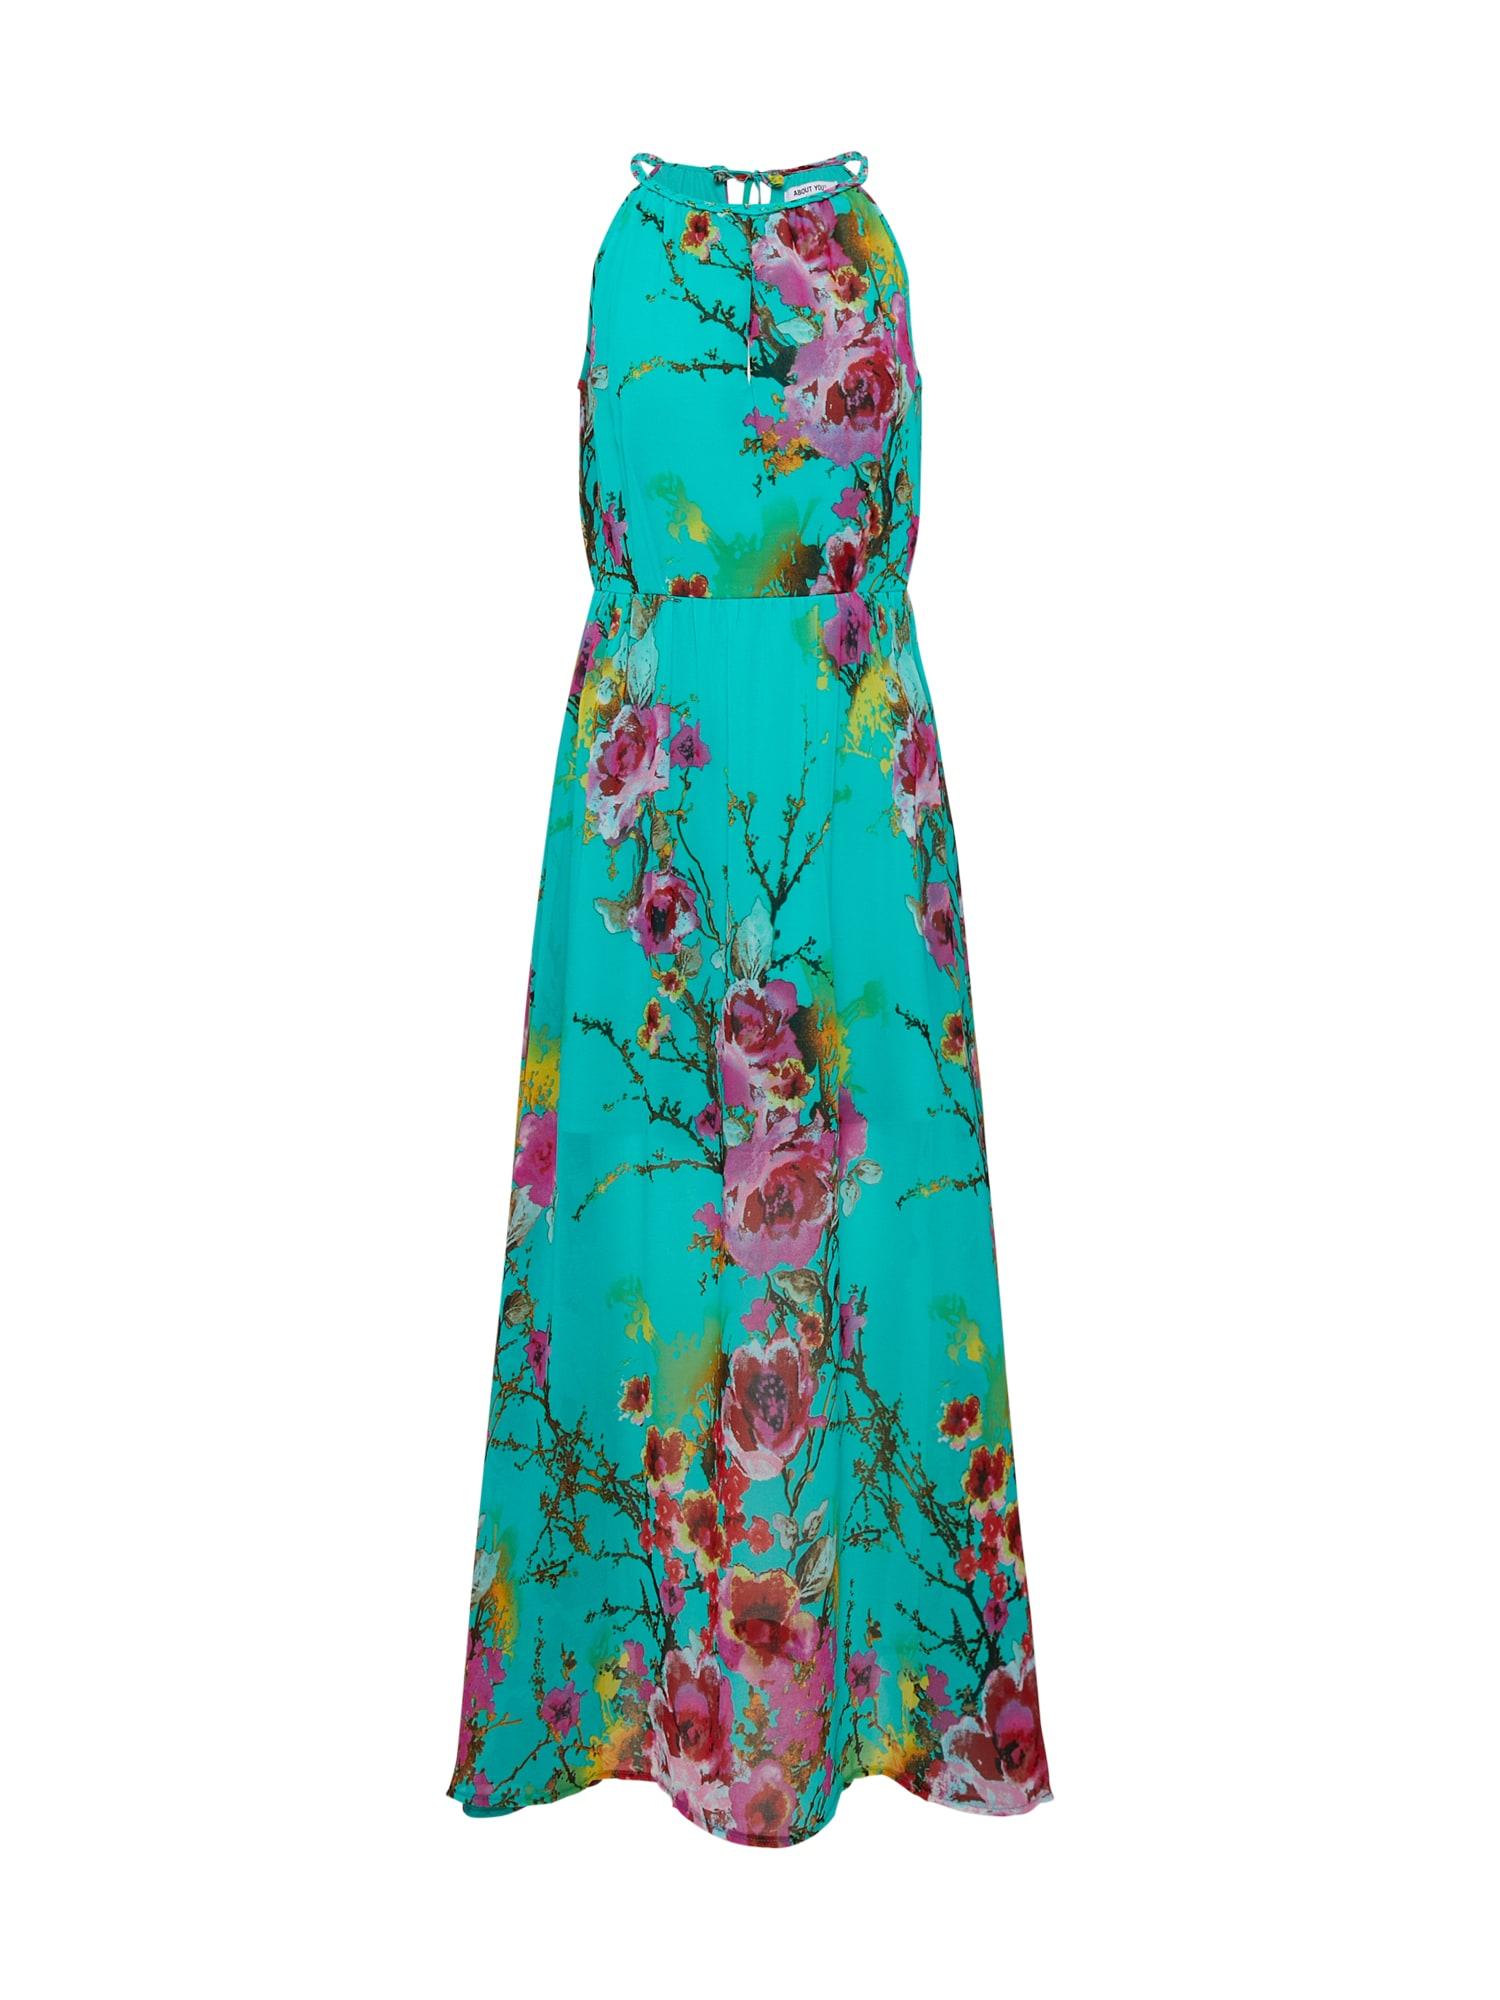 ABOUT YOU, Dames Zomerjurk 'Vincenza', turquoise / gemengde kleuren